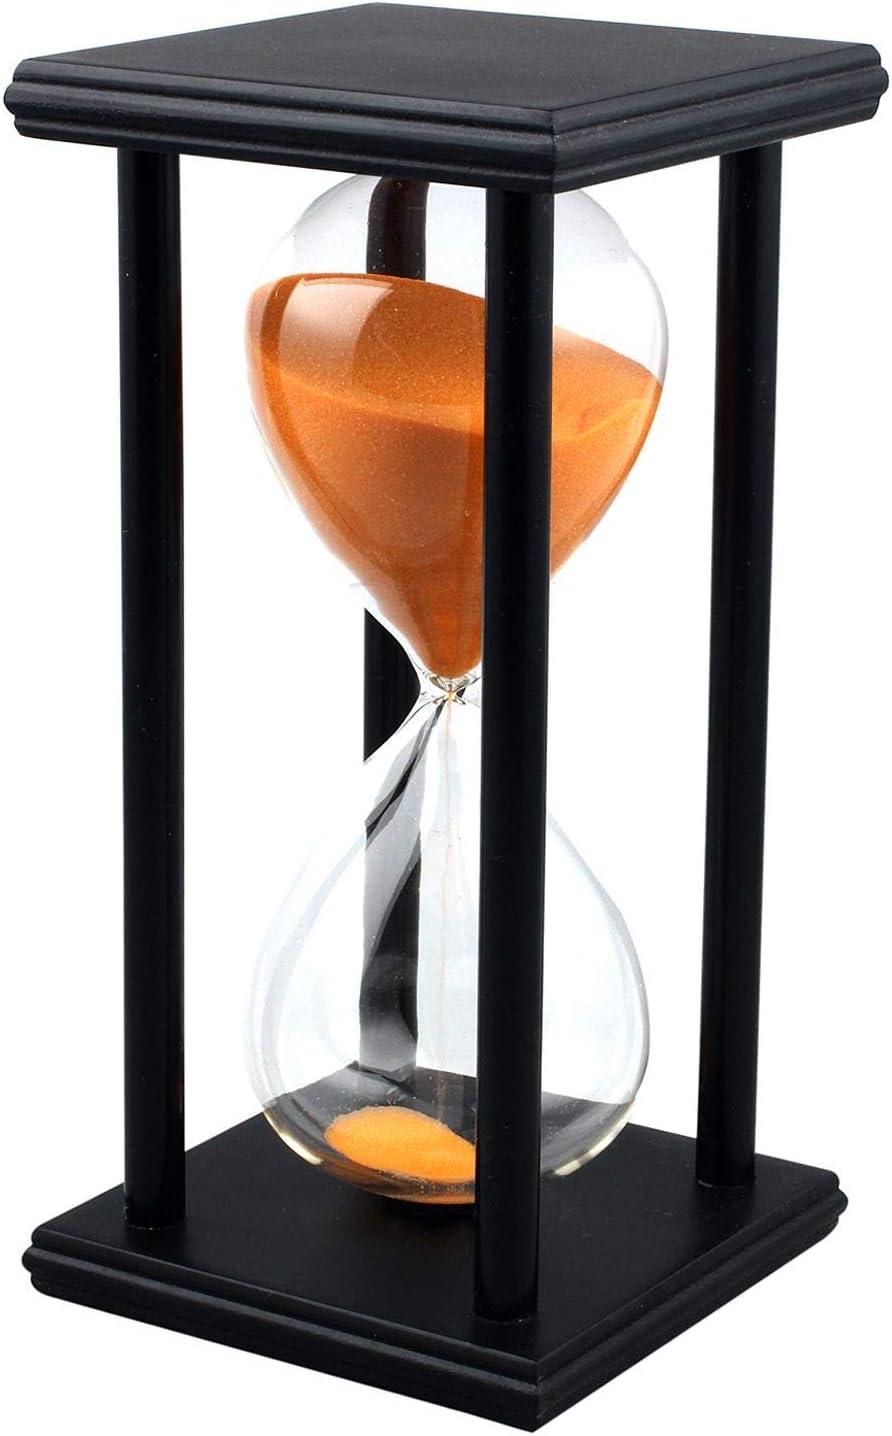 Lodunsyr Reloj De Arena 60 Minutos Timer Chico para Ornamento Restaurante Decoración Hogar Escritorio De Oficina Navidad Niña Reloj De Arena Temporizador 60 Min Hourglass Naranja